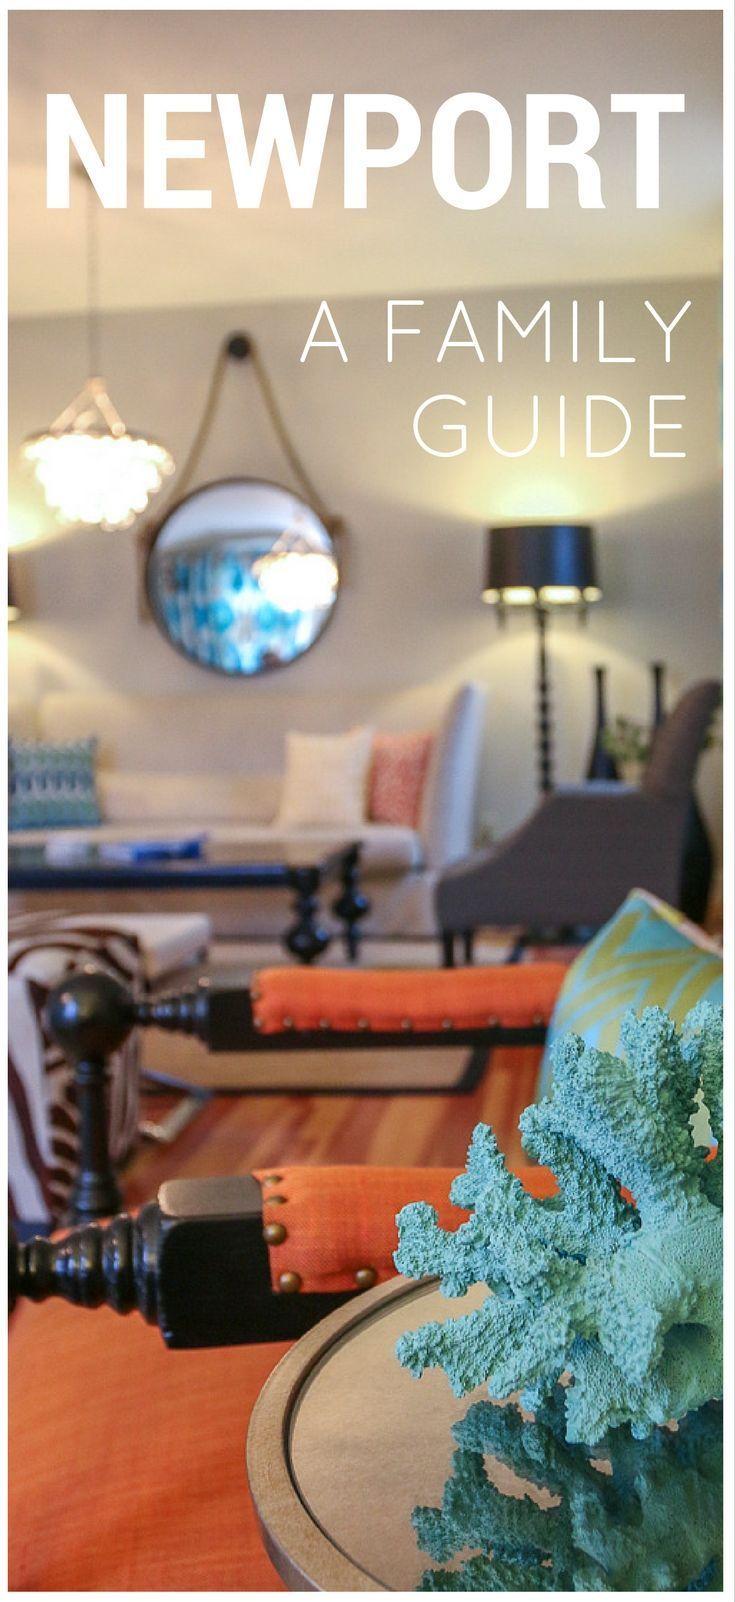 5 tips for the best newport mansions weekend with kids in rhode island rhode islandluxury hotelsnewportmansionsvacations